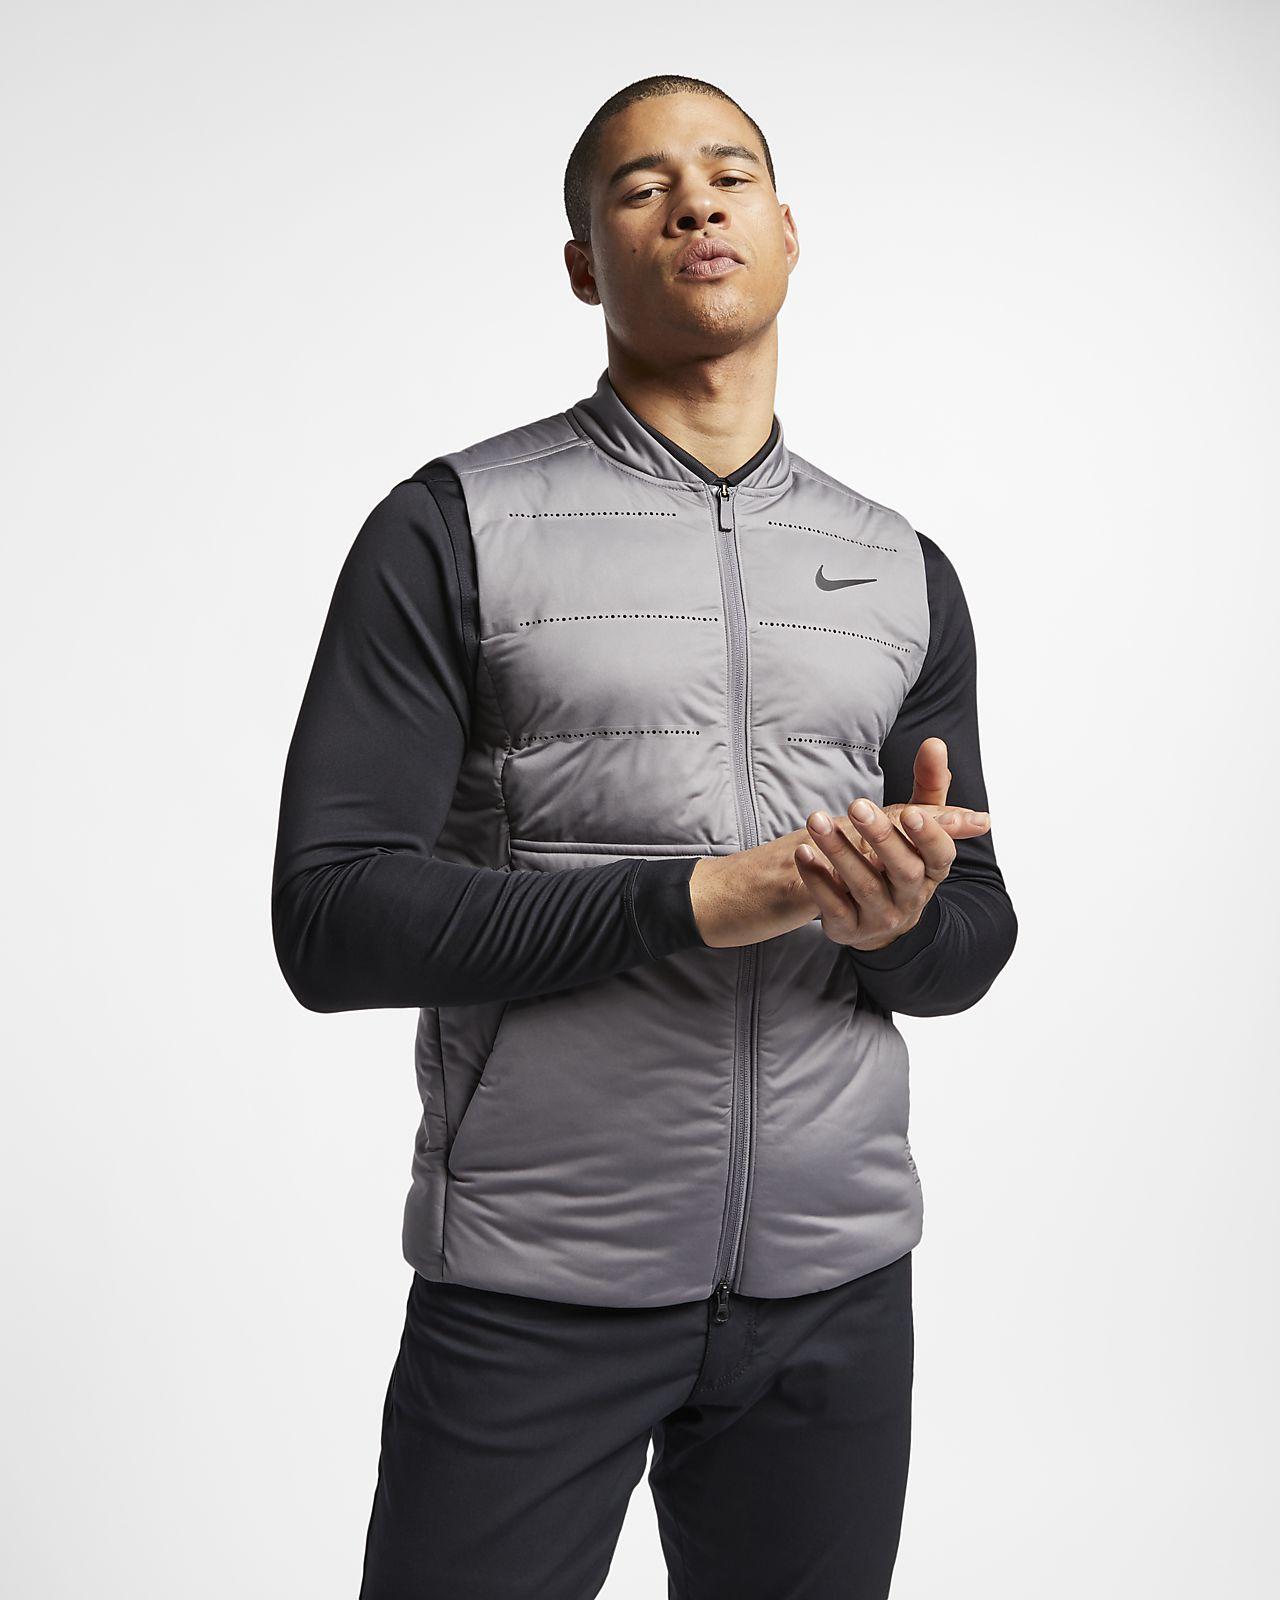 Męski bezrękawnik do golfa Nike AeroLoft